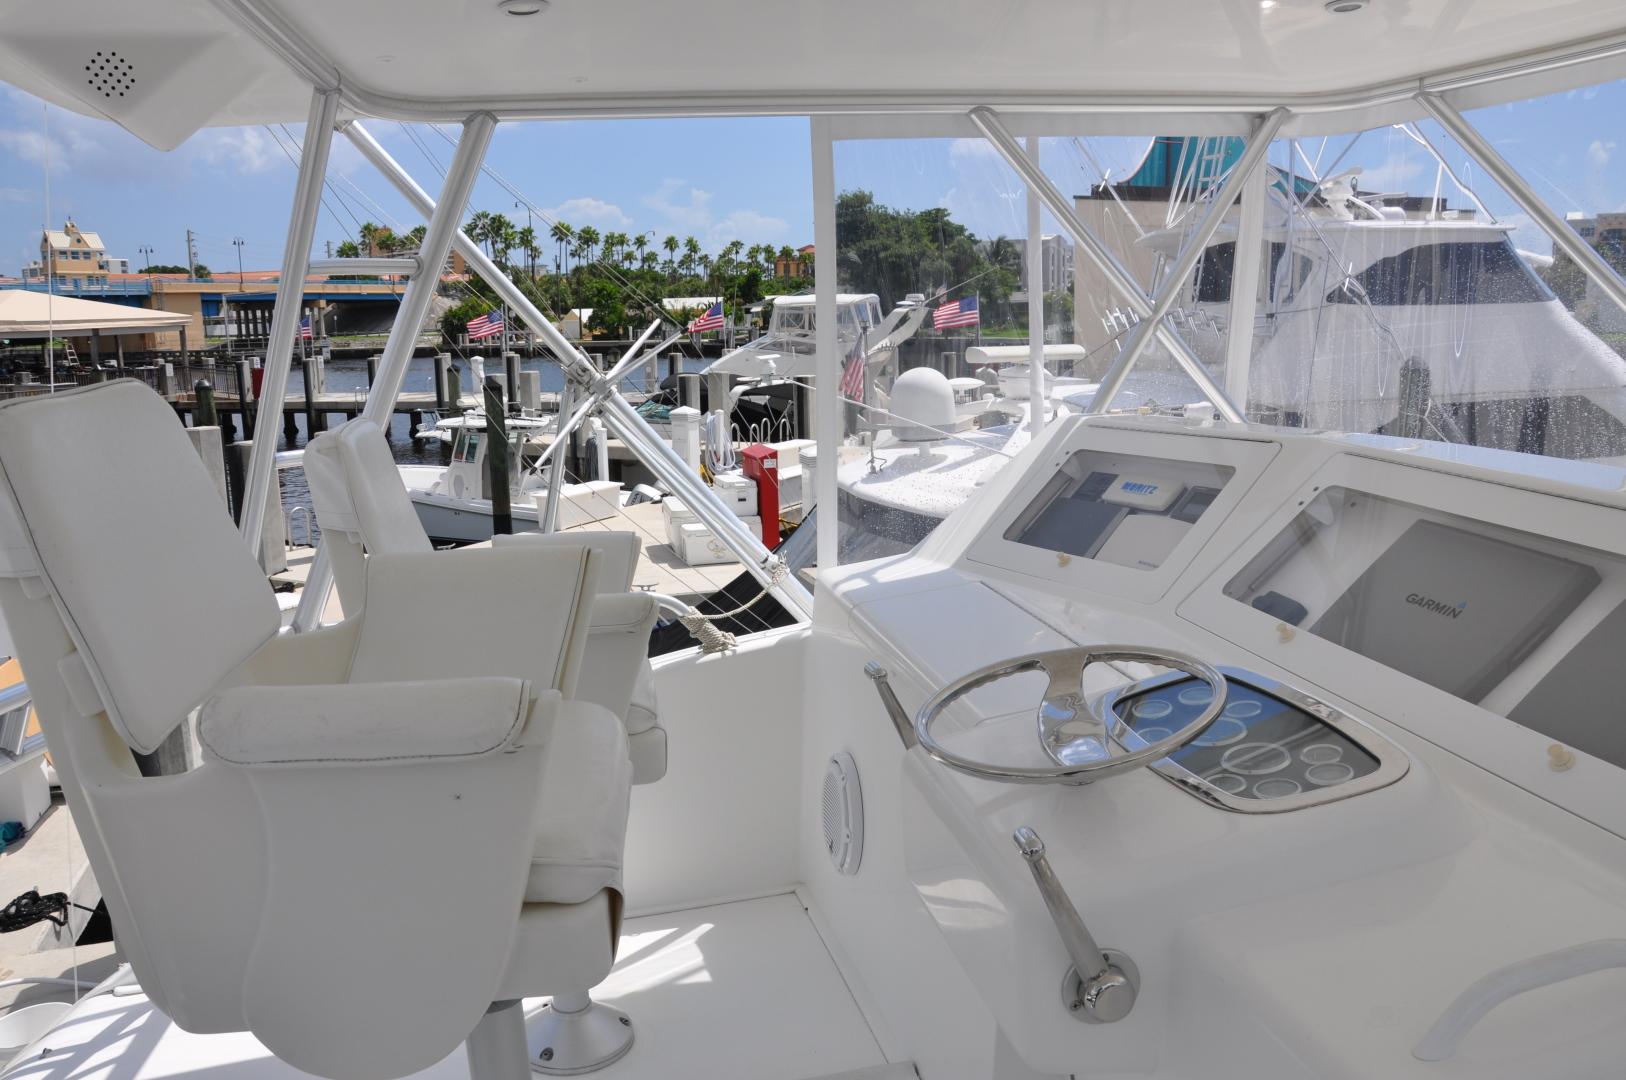 Viking-Convertible 2003-Reel Cowboy Deerfield Beach-Florida-United States-Flybridge/Helm Station-1546879 | Thumbnail